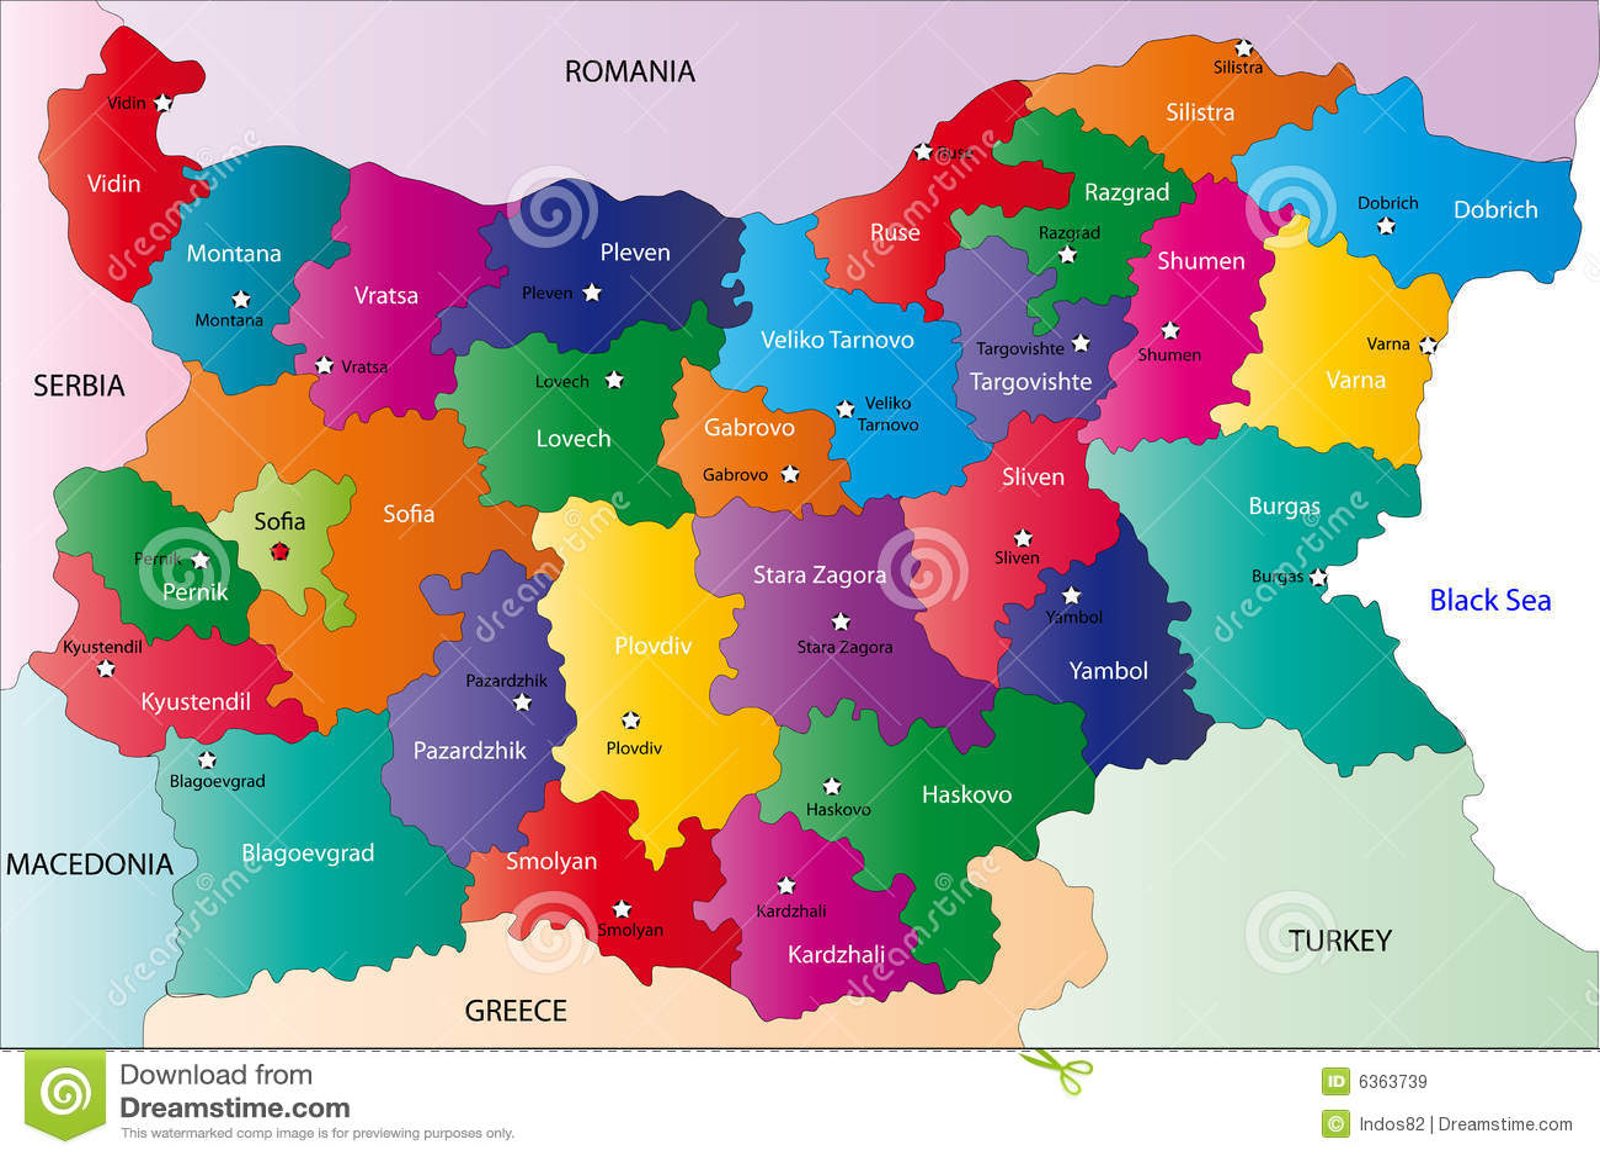 Bulgaria Map Royalty Free Stock Images Image - Bulgaria map